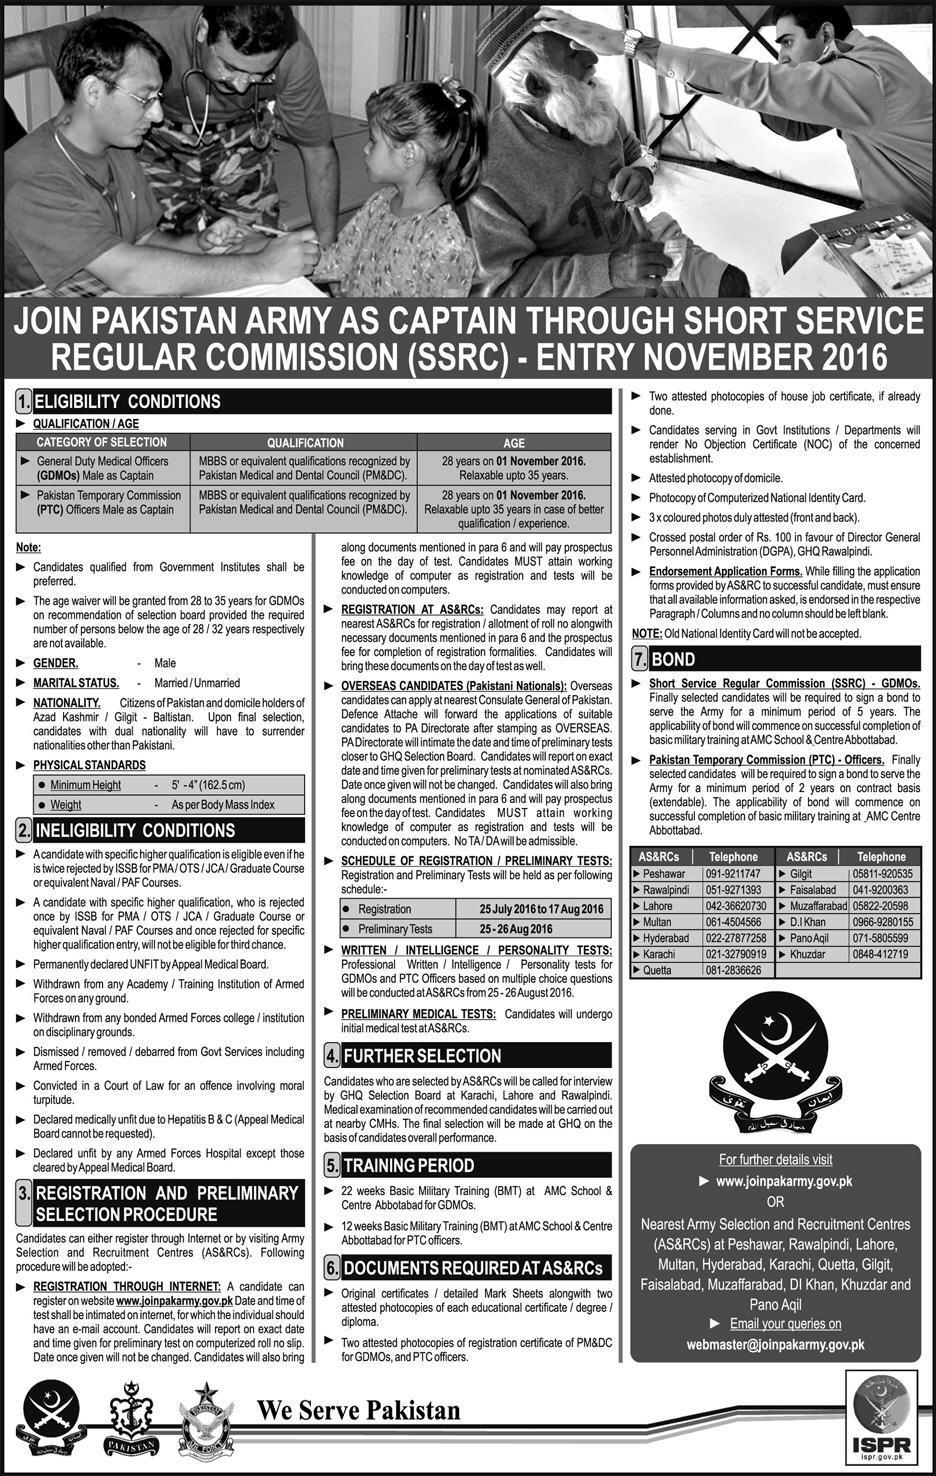 Join Pak Army as Captain through Short Public Service Commission